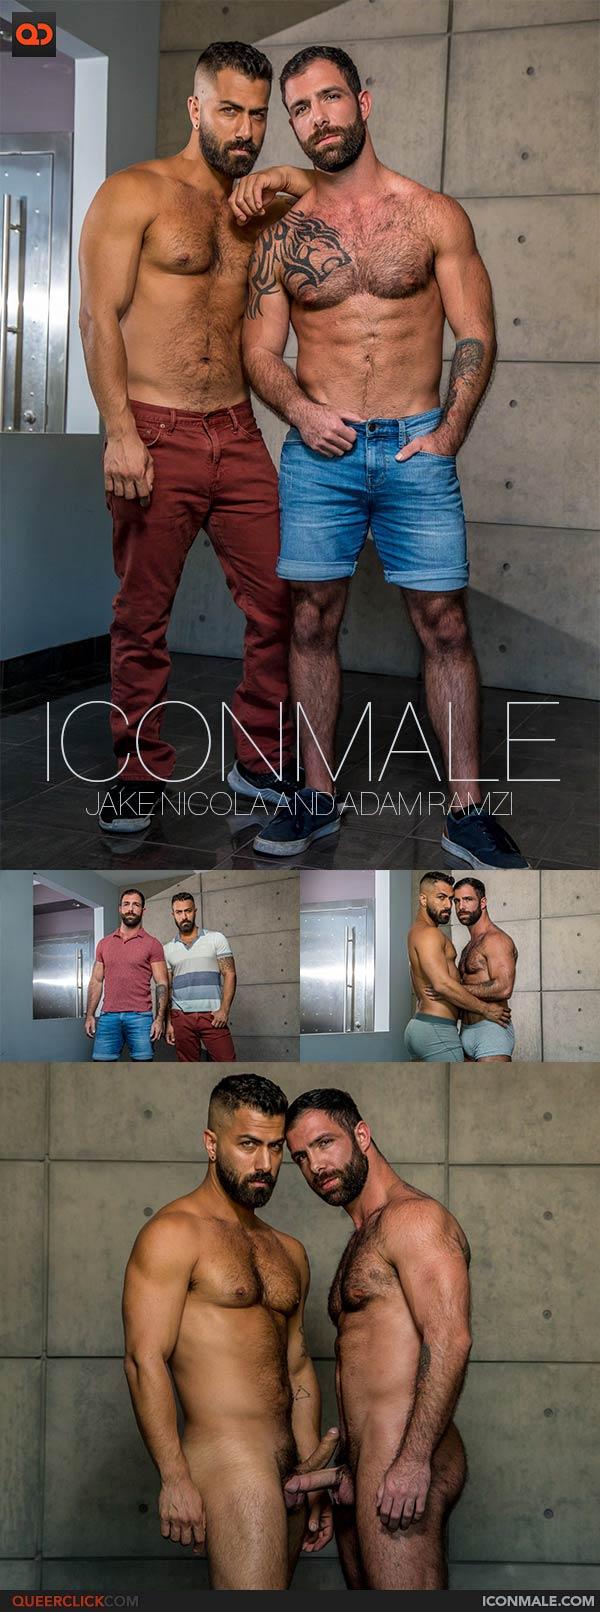 Adam Ramzi Porn Masters iconmale: jake nicola and adam ramzi - queerclick